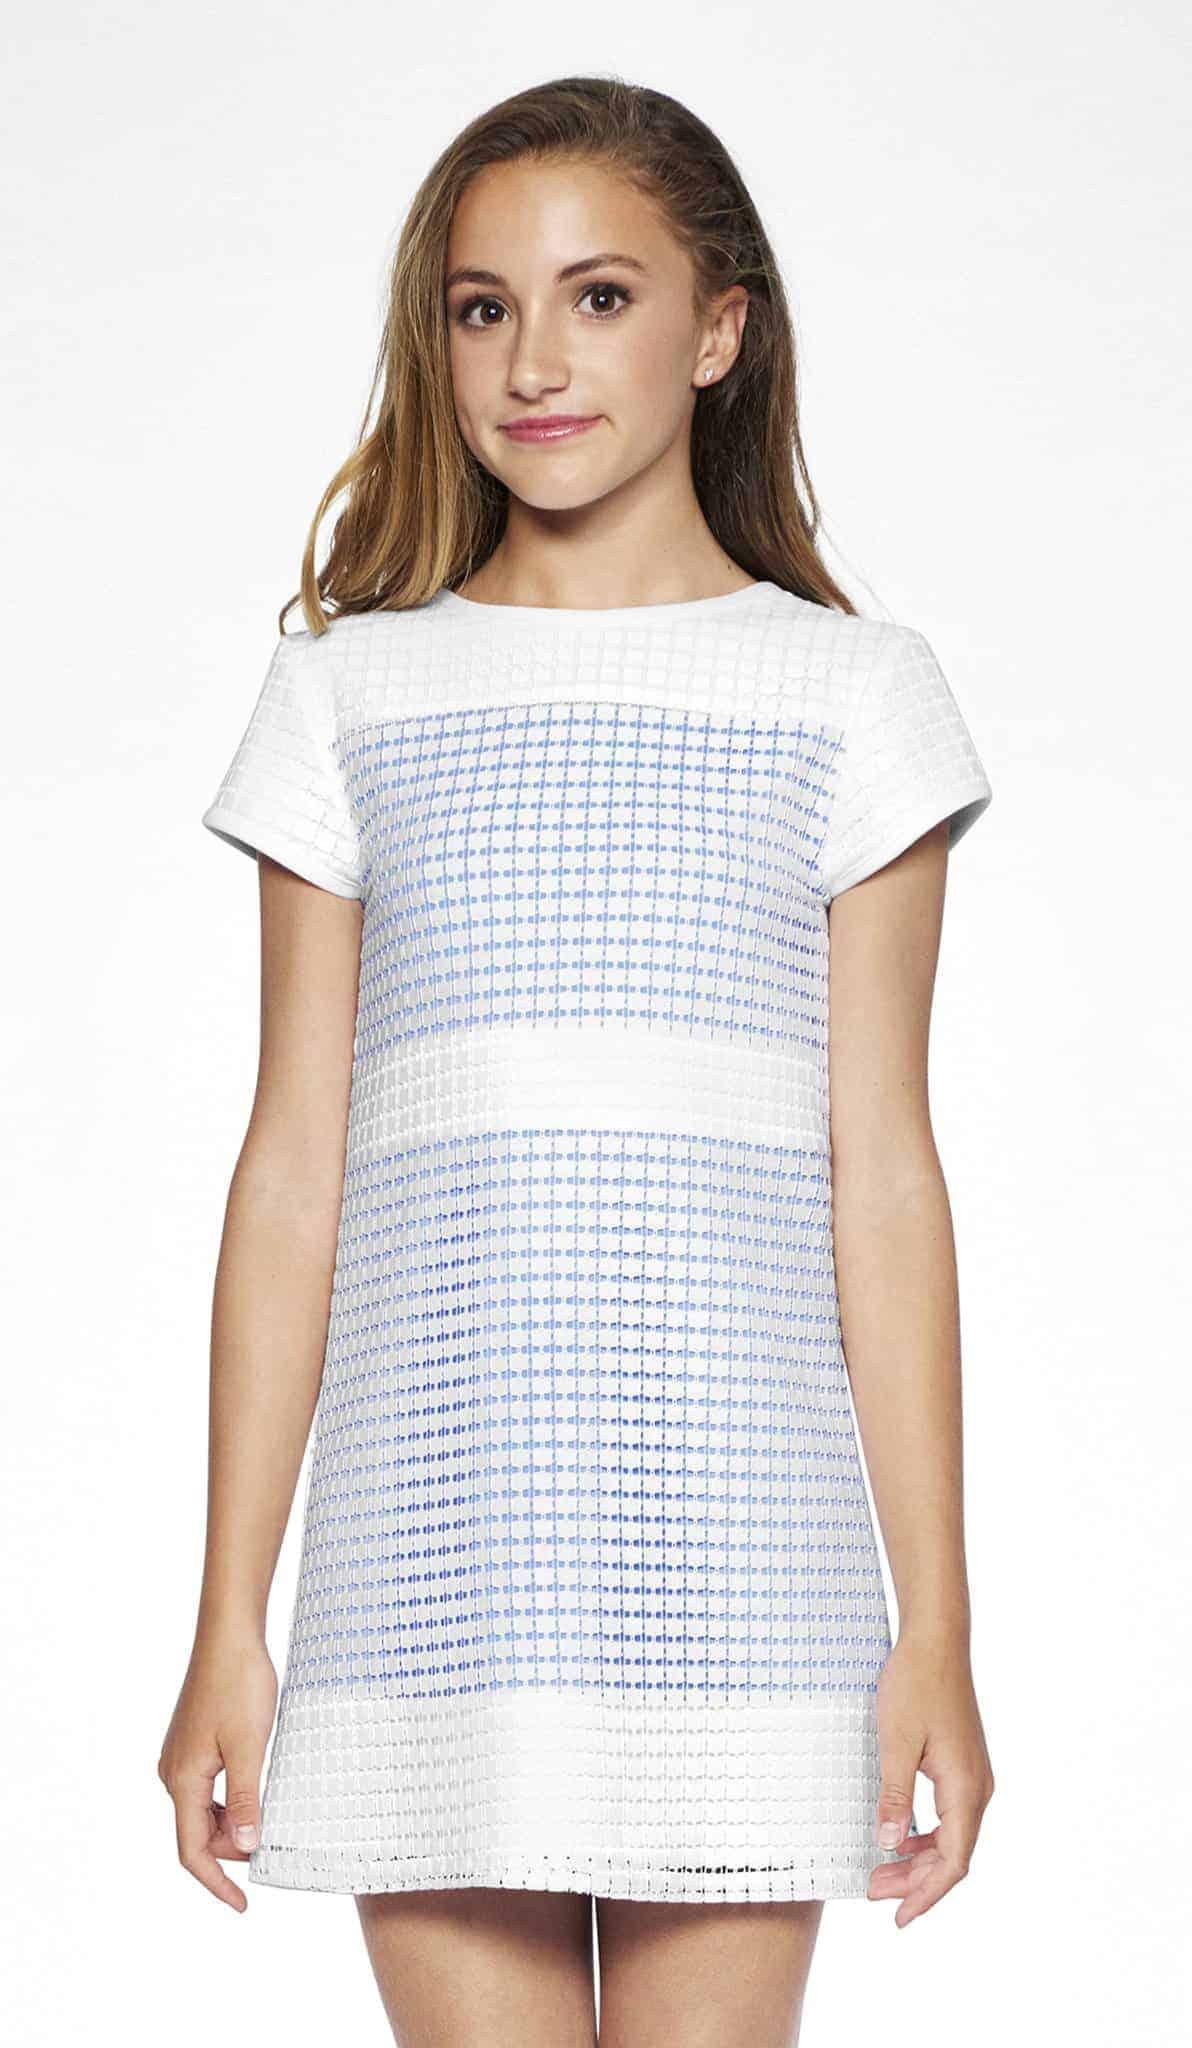 336c2f7409e87 Tween Sally Miller Naples Dress ~White/Blue ⋆ Gypsy Girl Tween Boutique